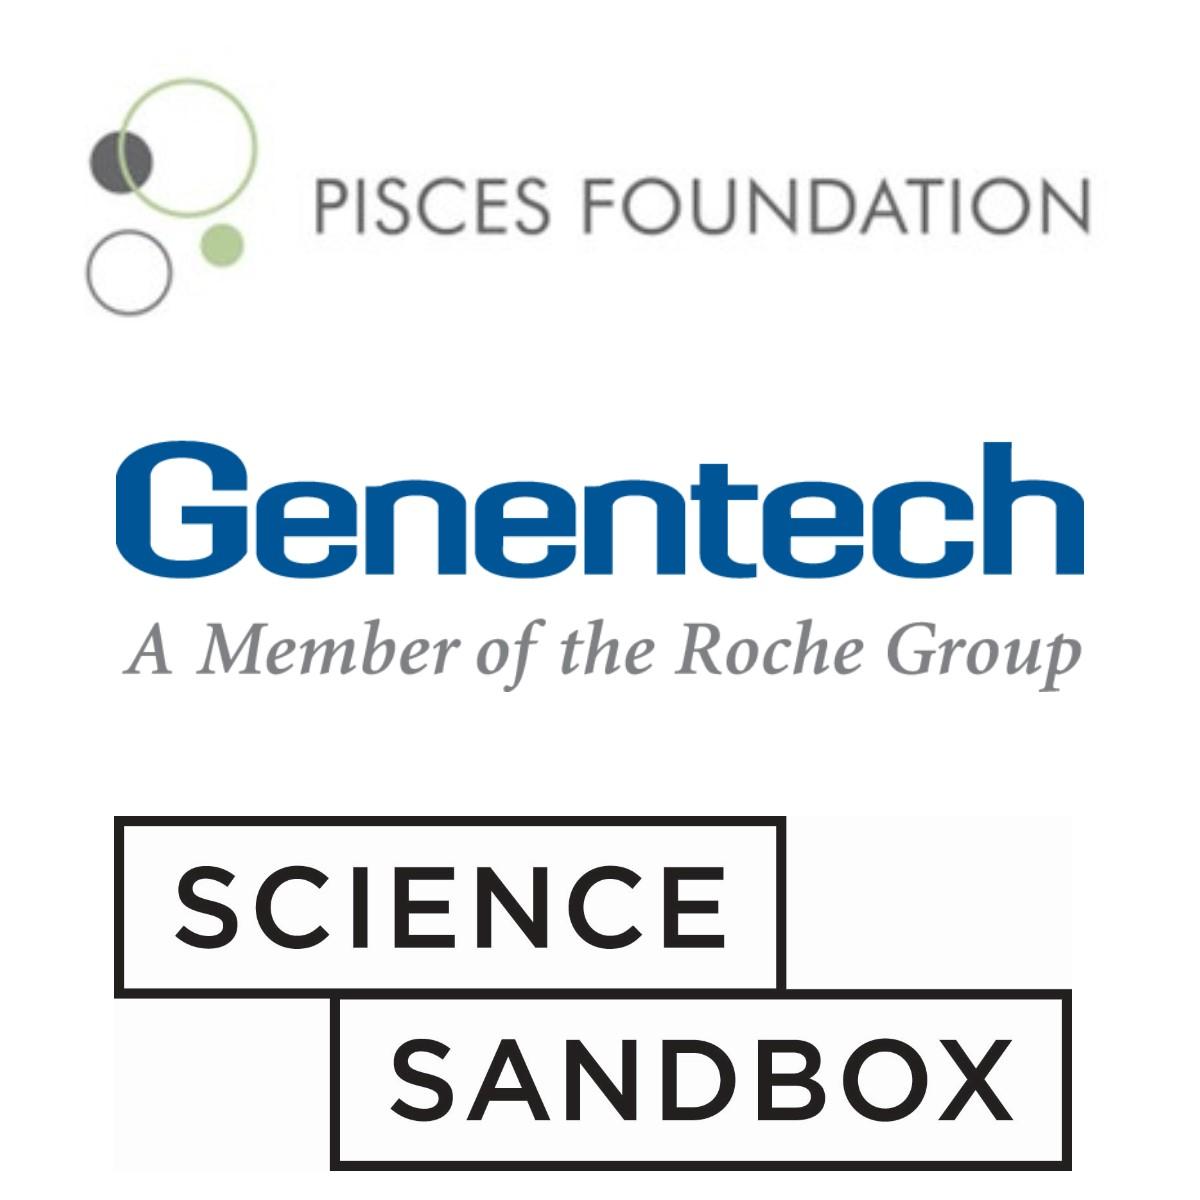 Pisces Foundation, Genentech, Science Sandbox logos